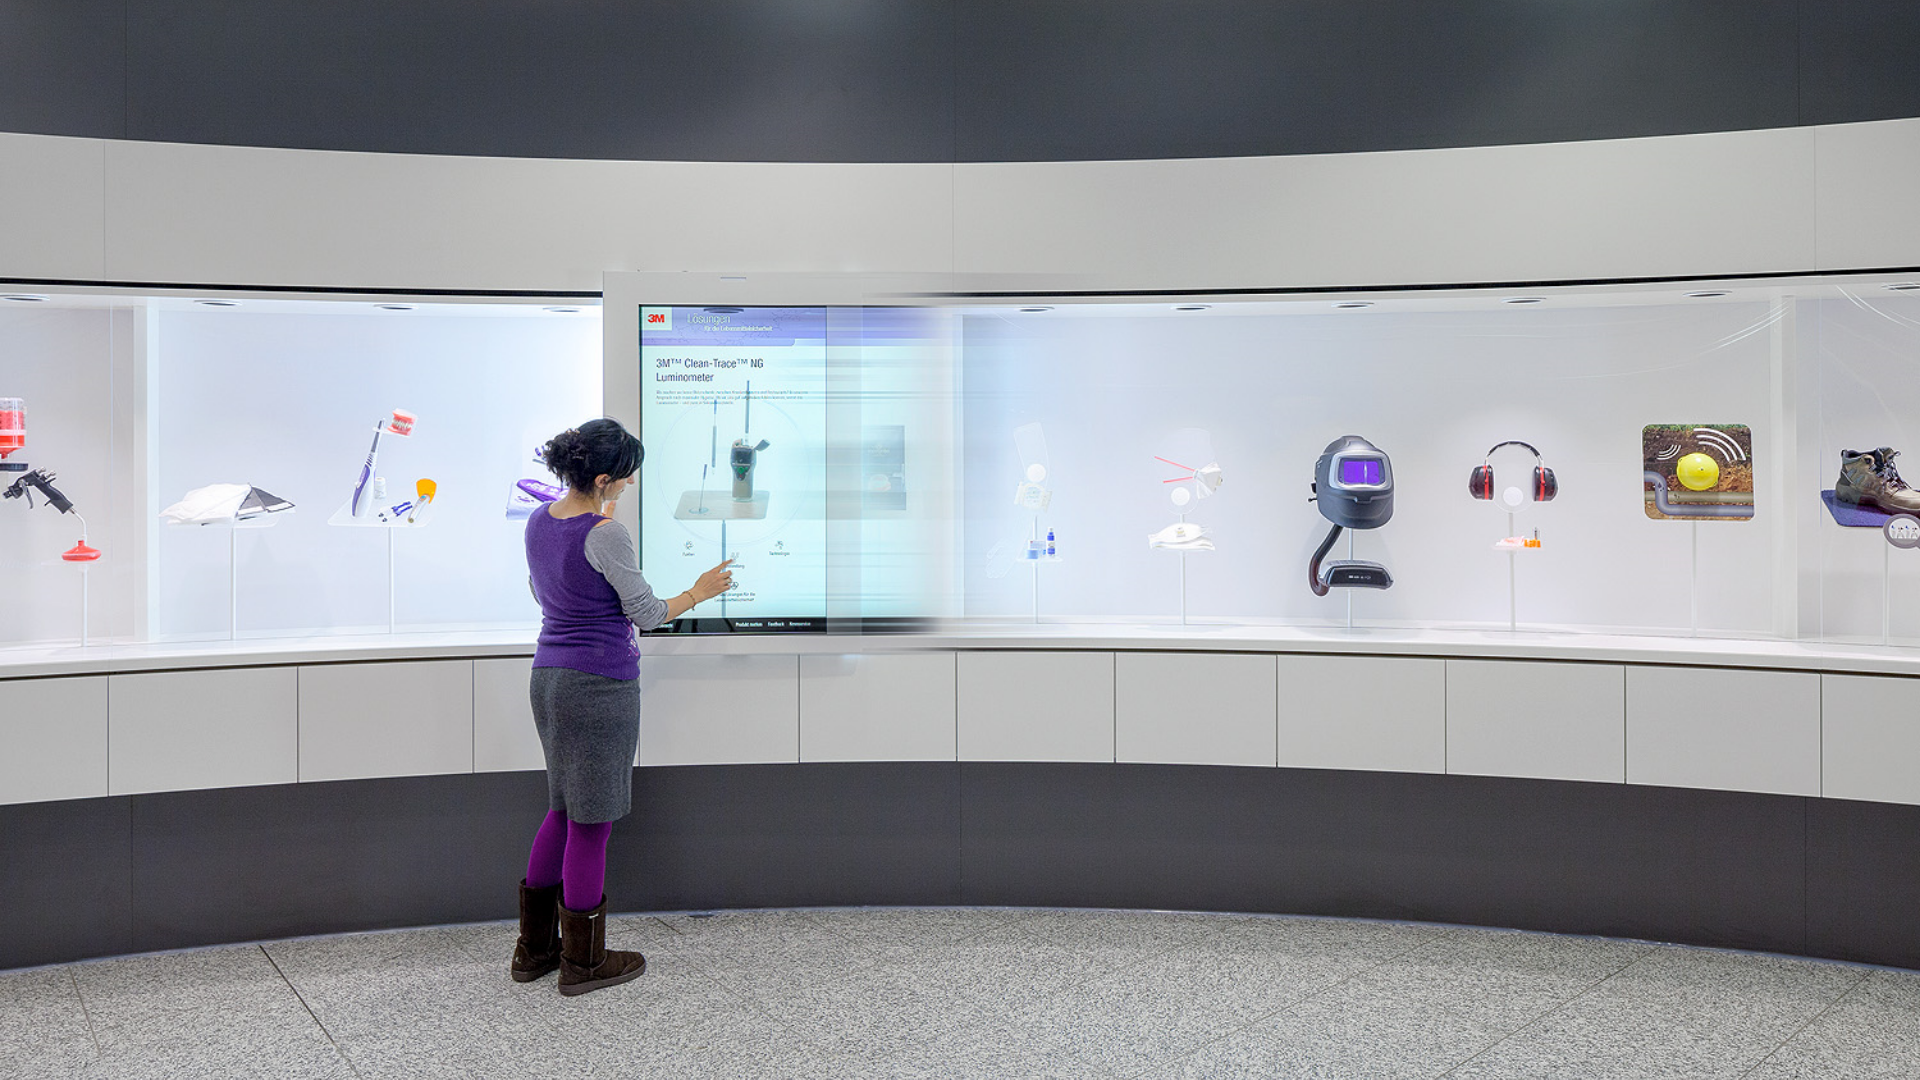 3M Deutschland World Of Innovation - Interaktive Installation - Shift Screen - Transparente OLED